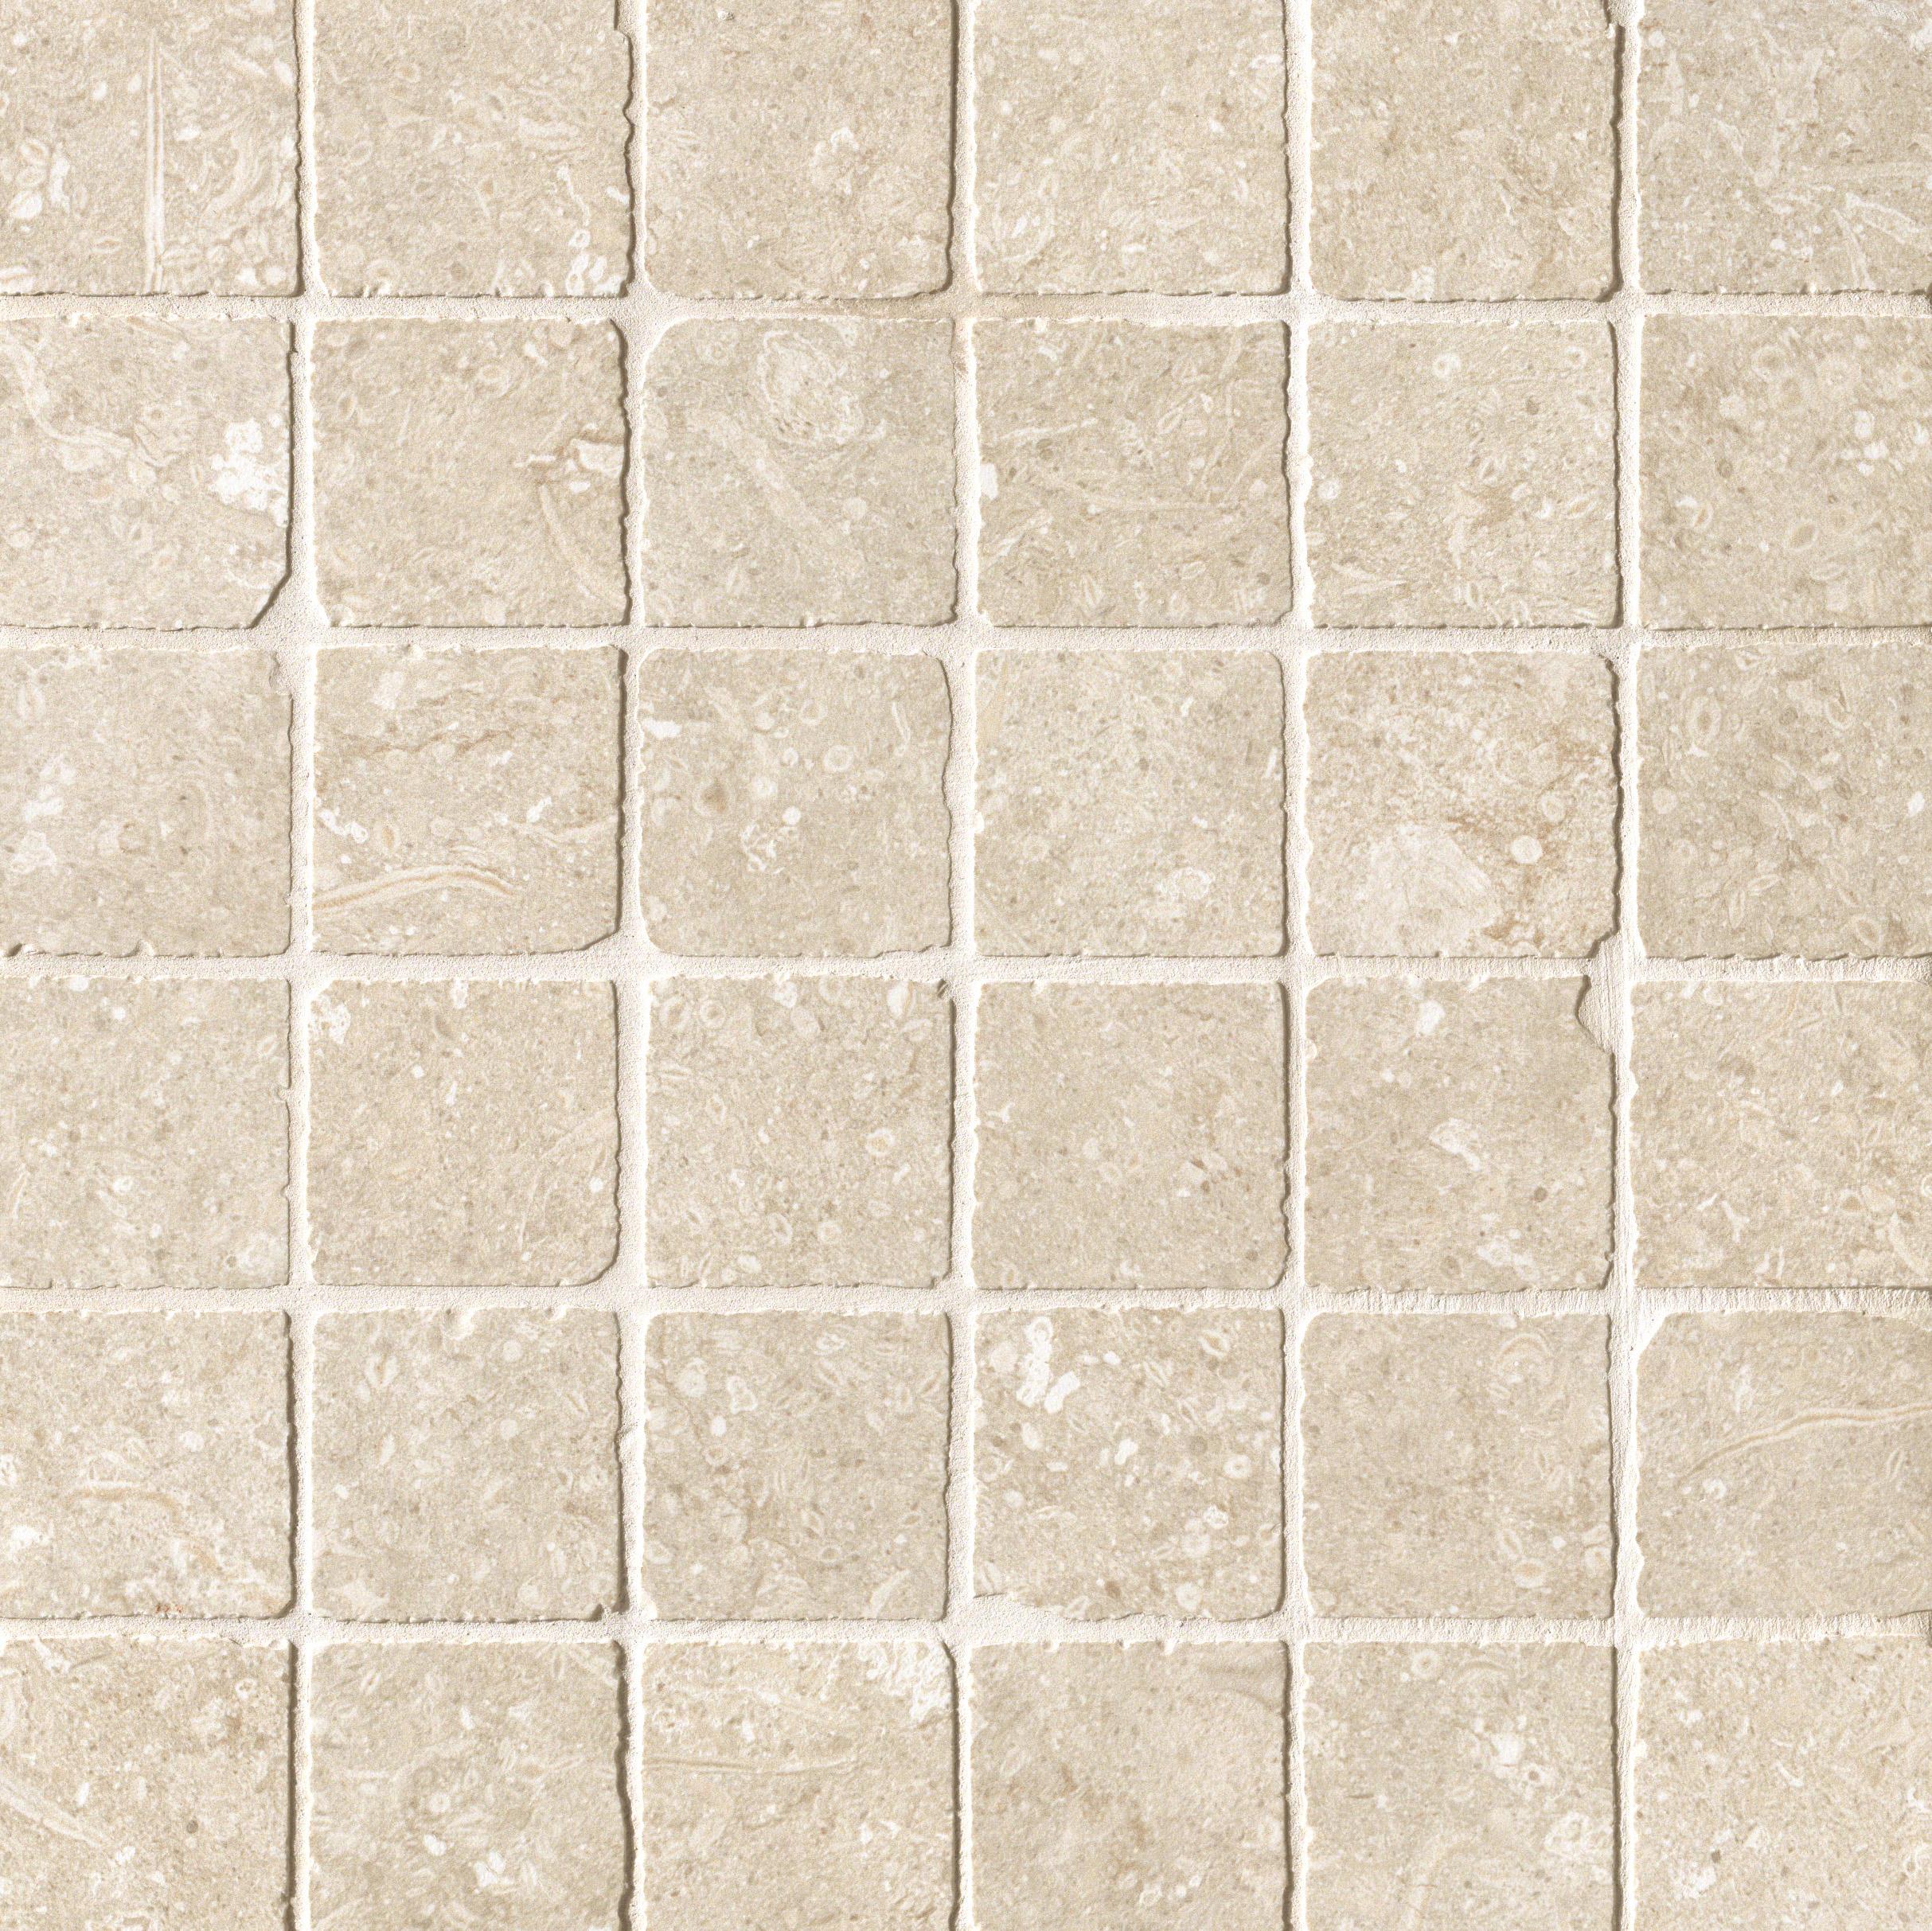 nord natural macromosaico matt ceramic mosaics from fap. Black Bedroom Furniture Sets. Home Design Ideas